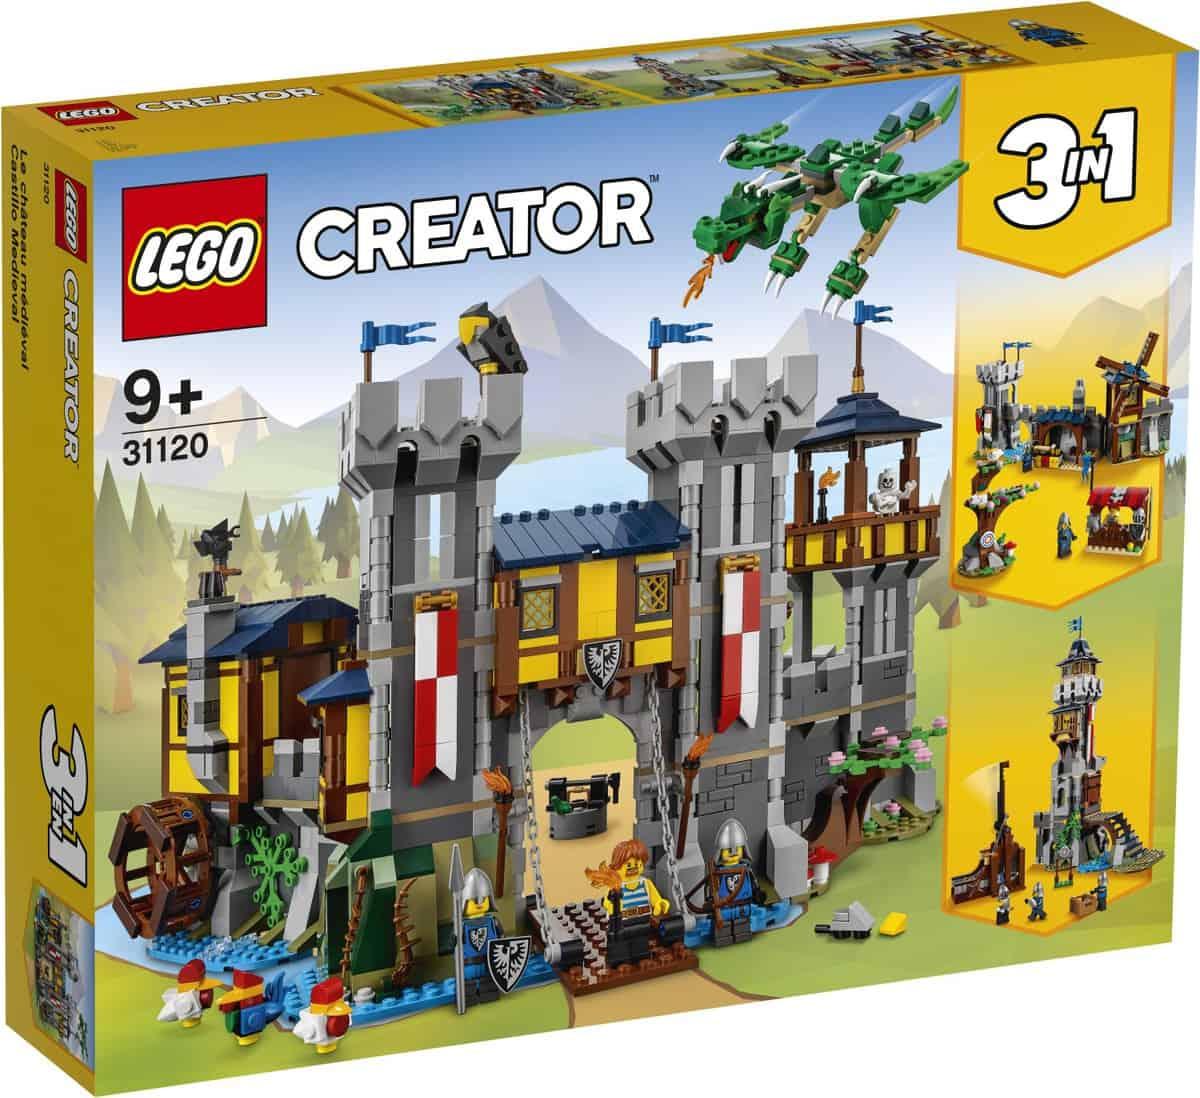 LEGO 31120 Medieval Castle - 20210502